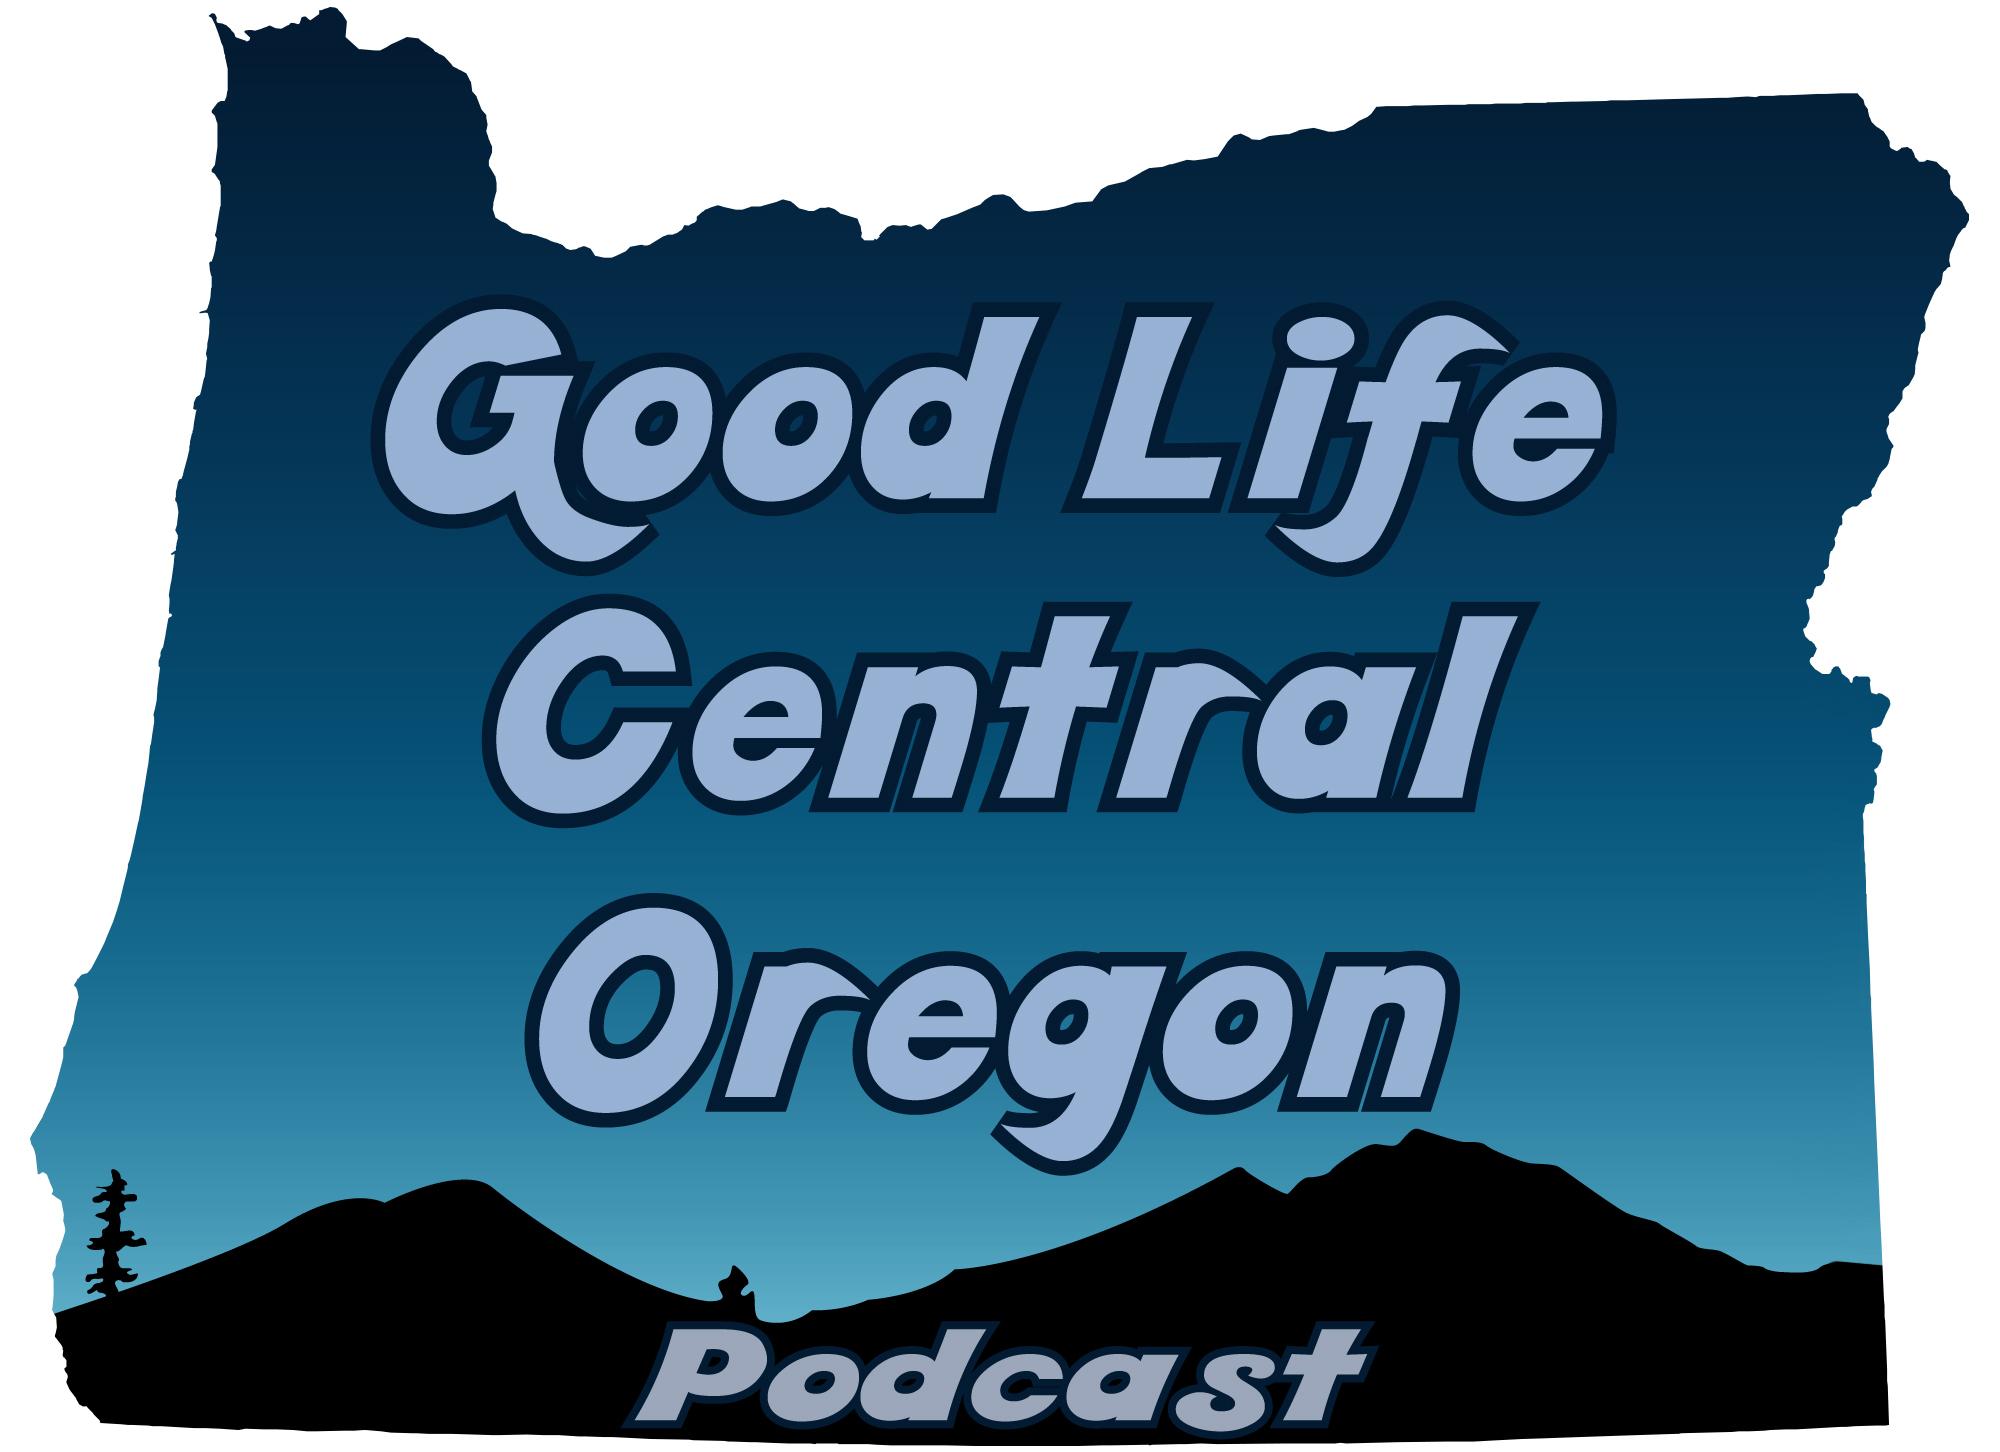 Good Life Central Oregon Podcast